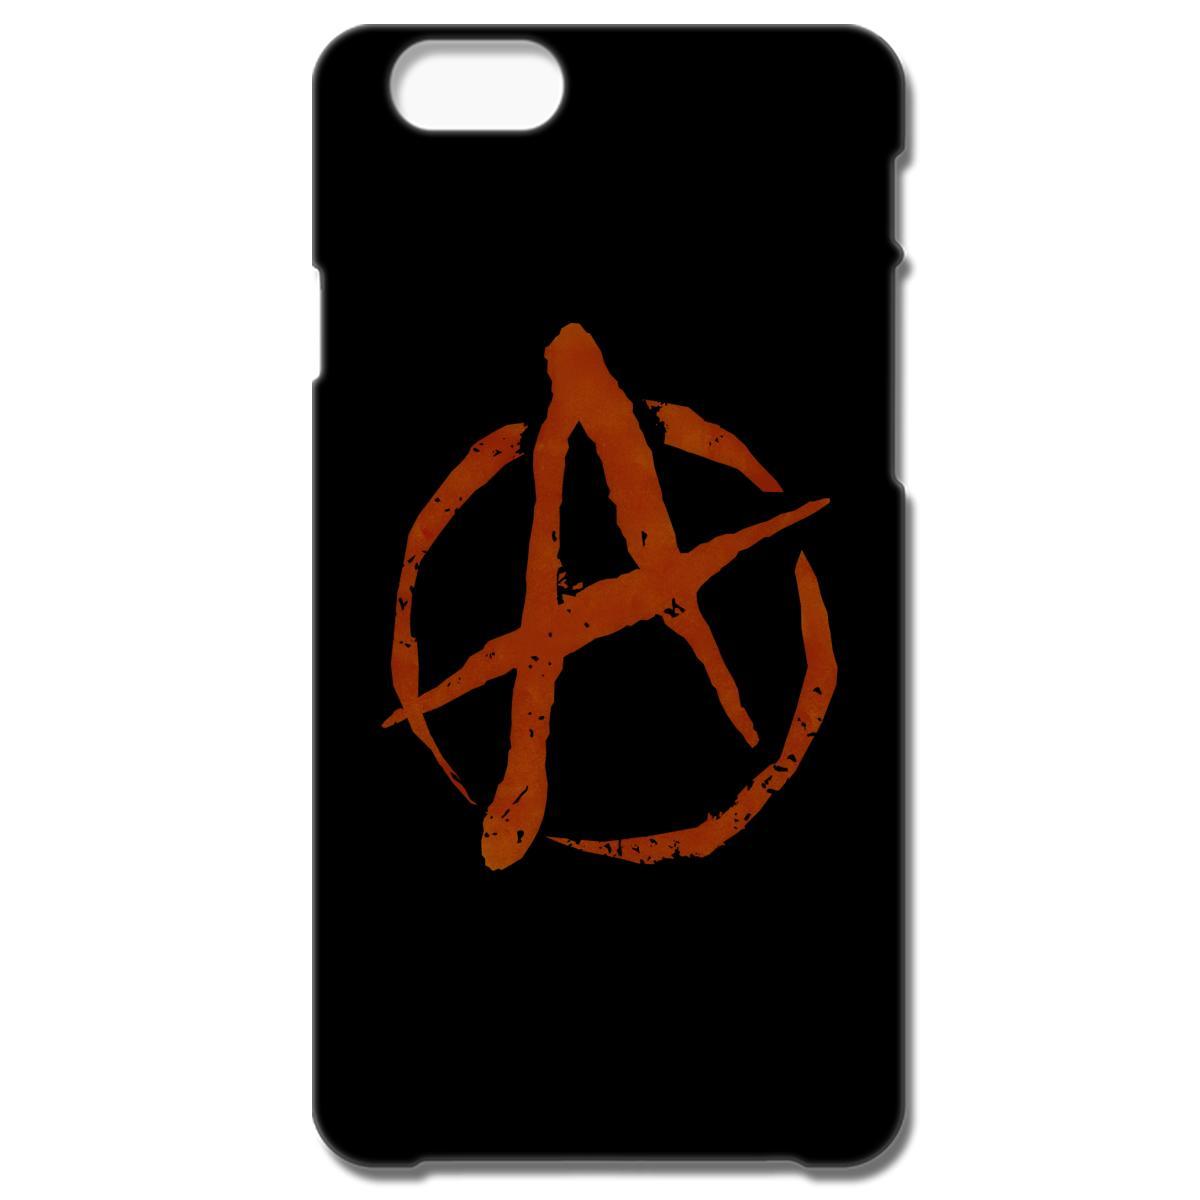 Anarchy Symbol Logo Iphone 66s Case Customon